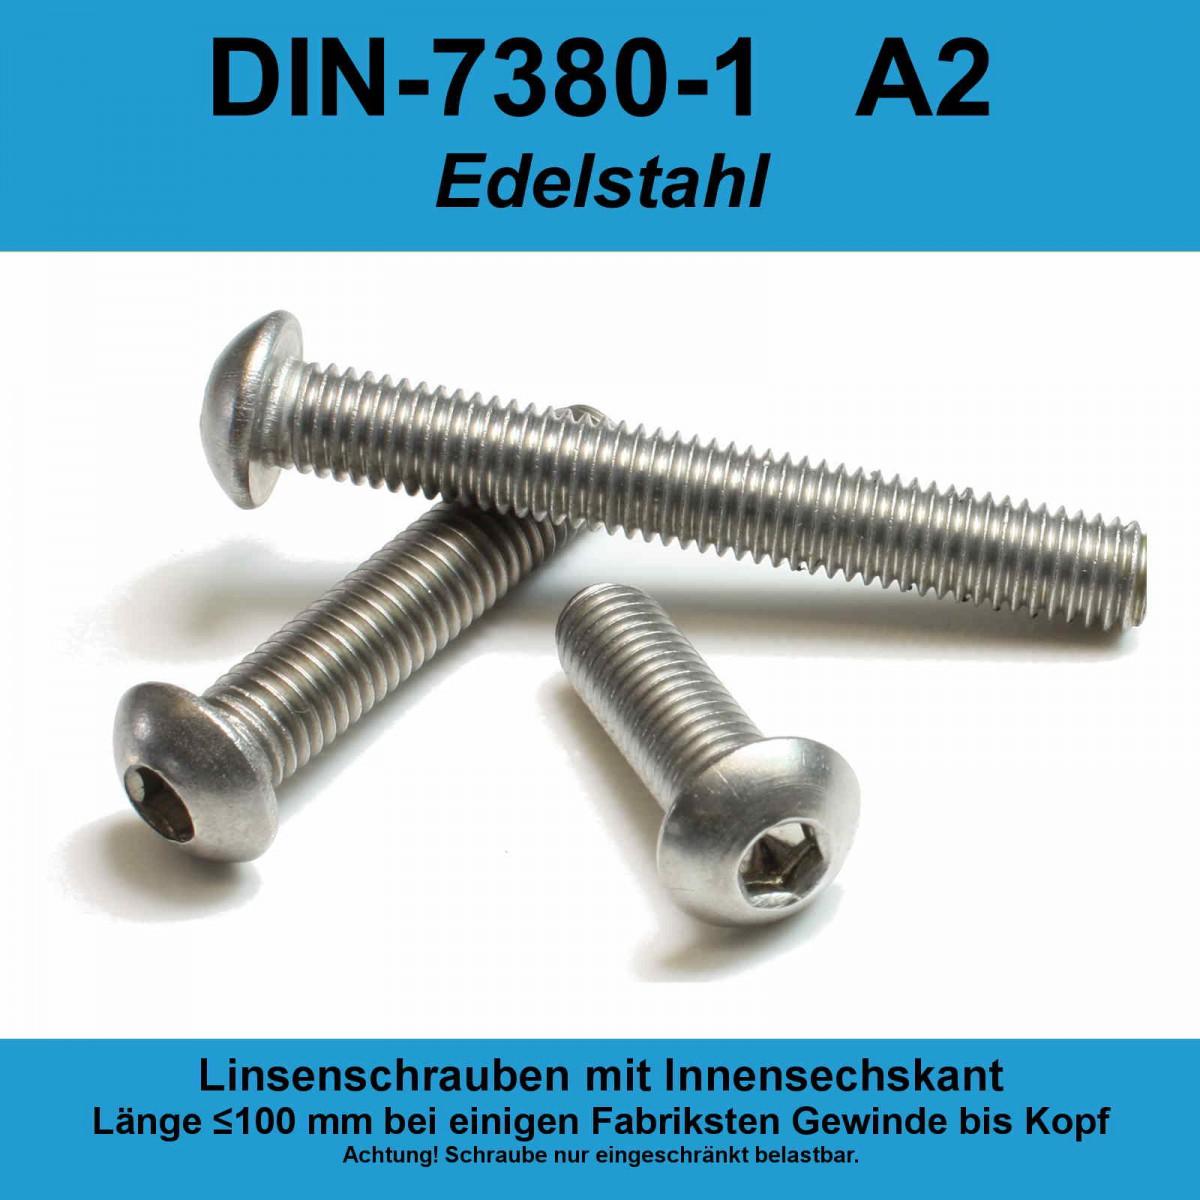 M10 Linsenkopfschrauben ISO 7380 EDELSTAHL V2A A2 Linsenschrauben Innensechskant